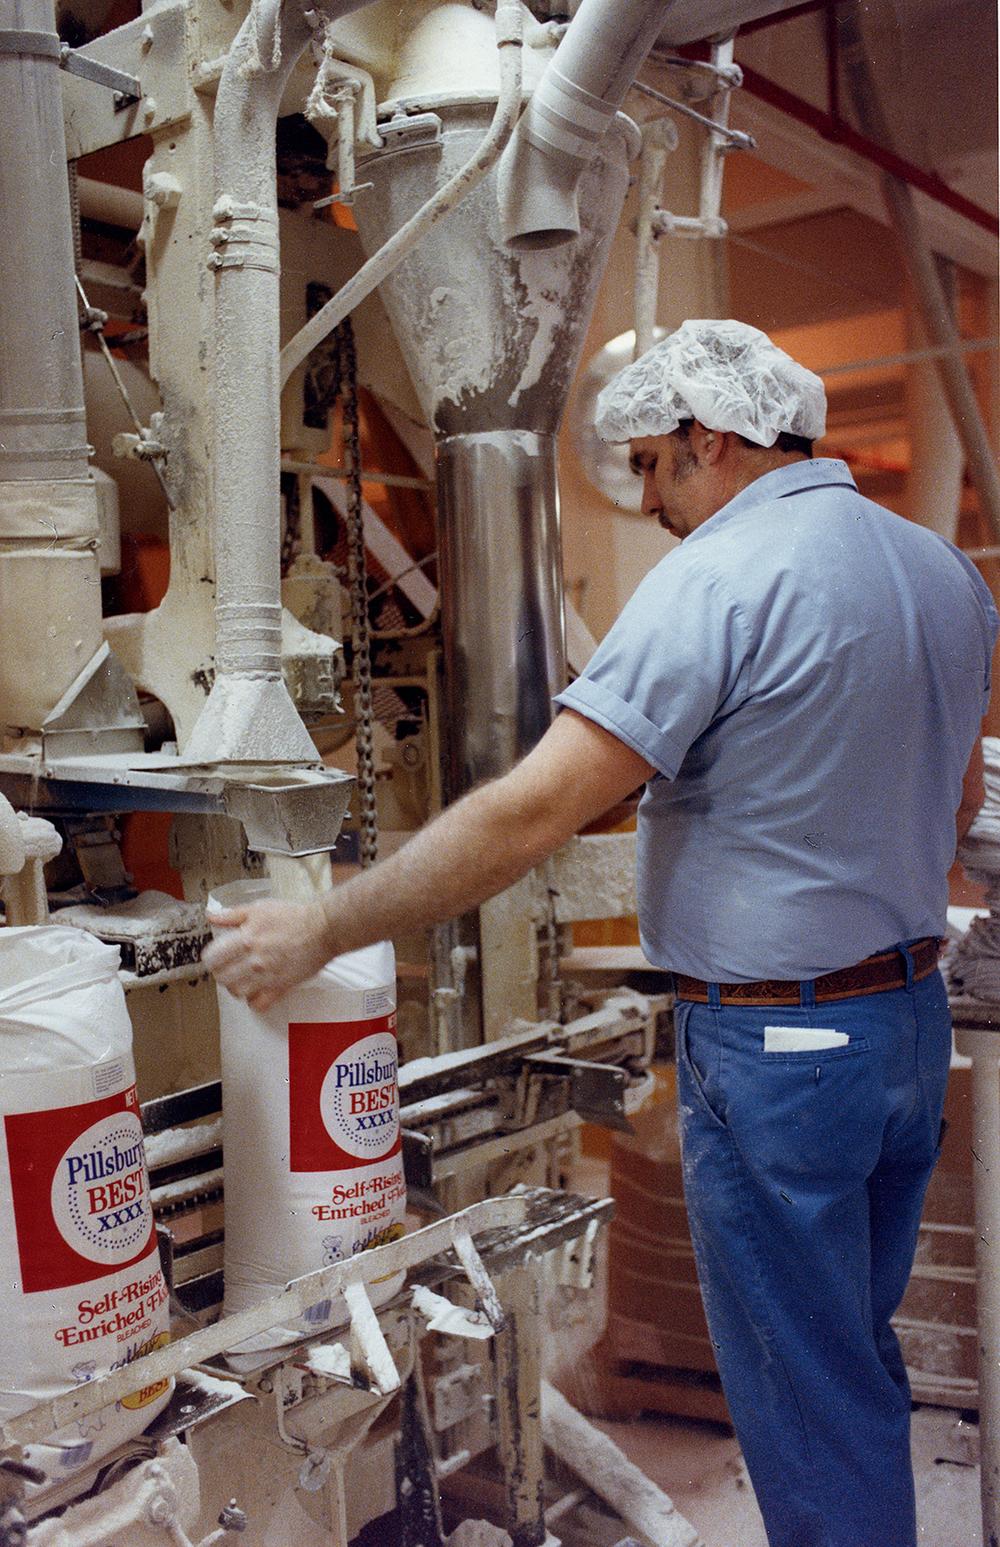 Pillsbury Mills, Feb. 1, 1989. Joe Lewis fills 25 lb. bags of flour. File/The State Journal-Register